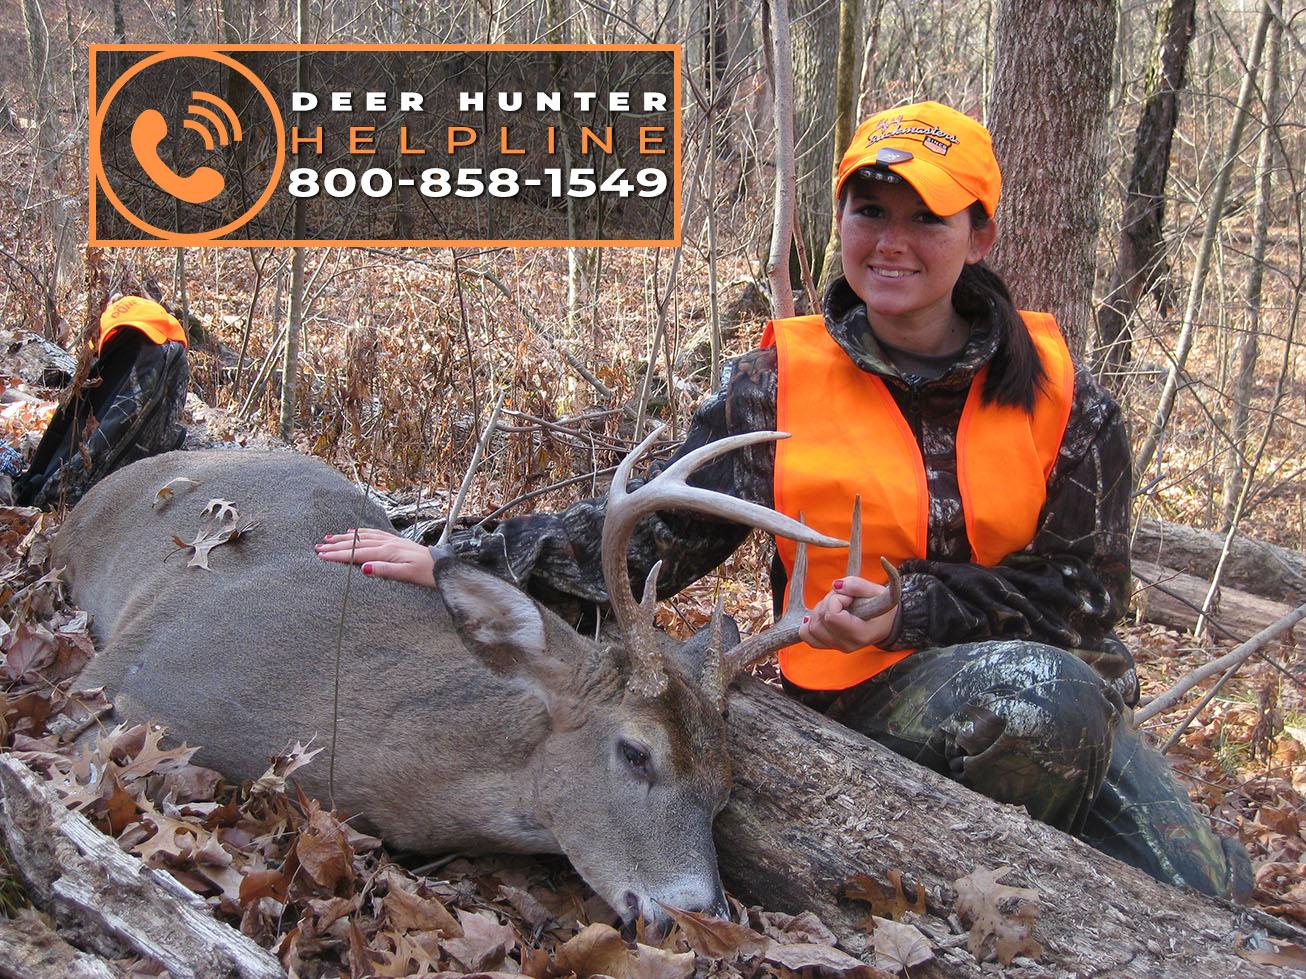 Kentucky Department Of Fish & Wildlife Deer Hunting Information with regard to Kentucky Deer Season 2021